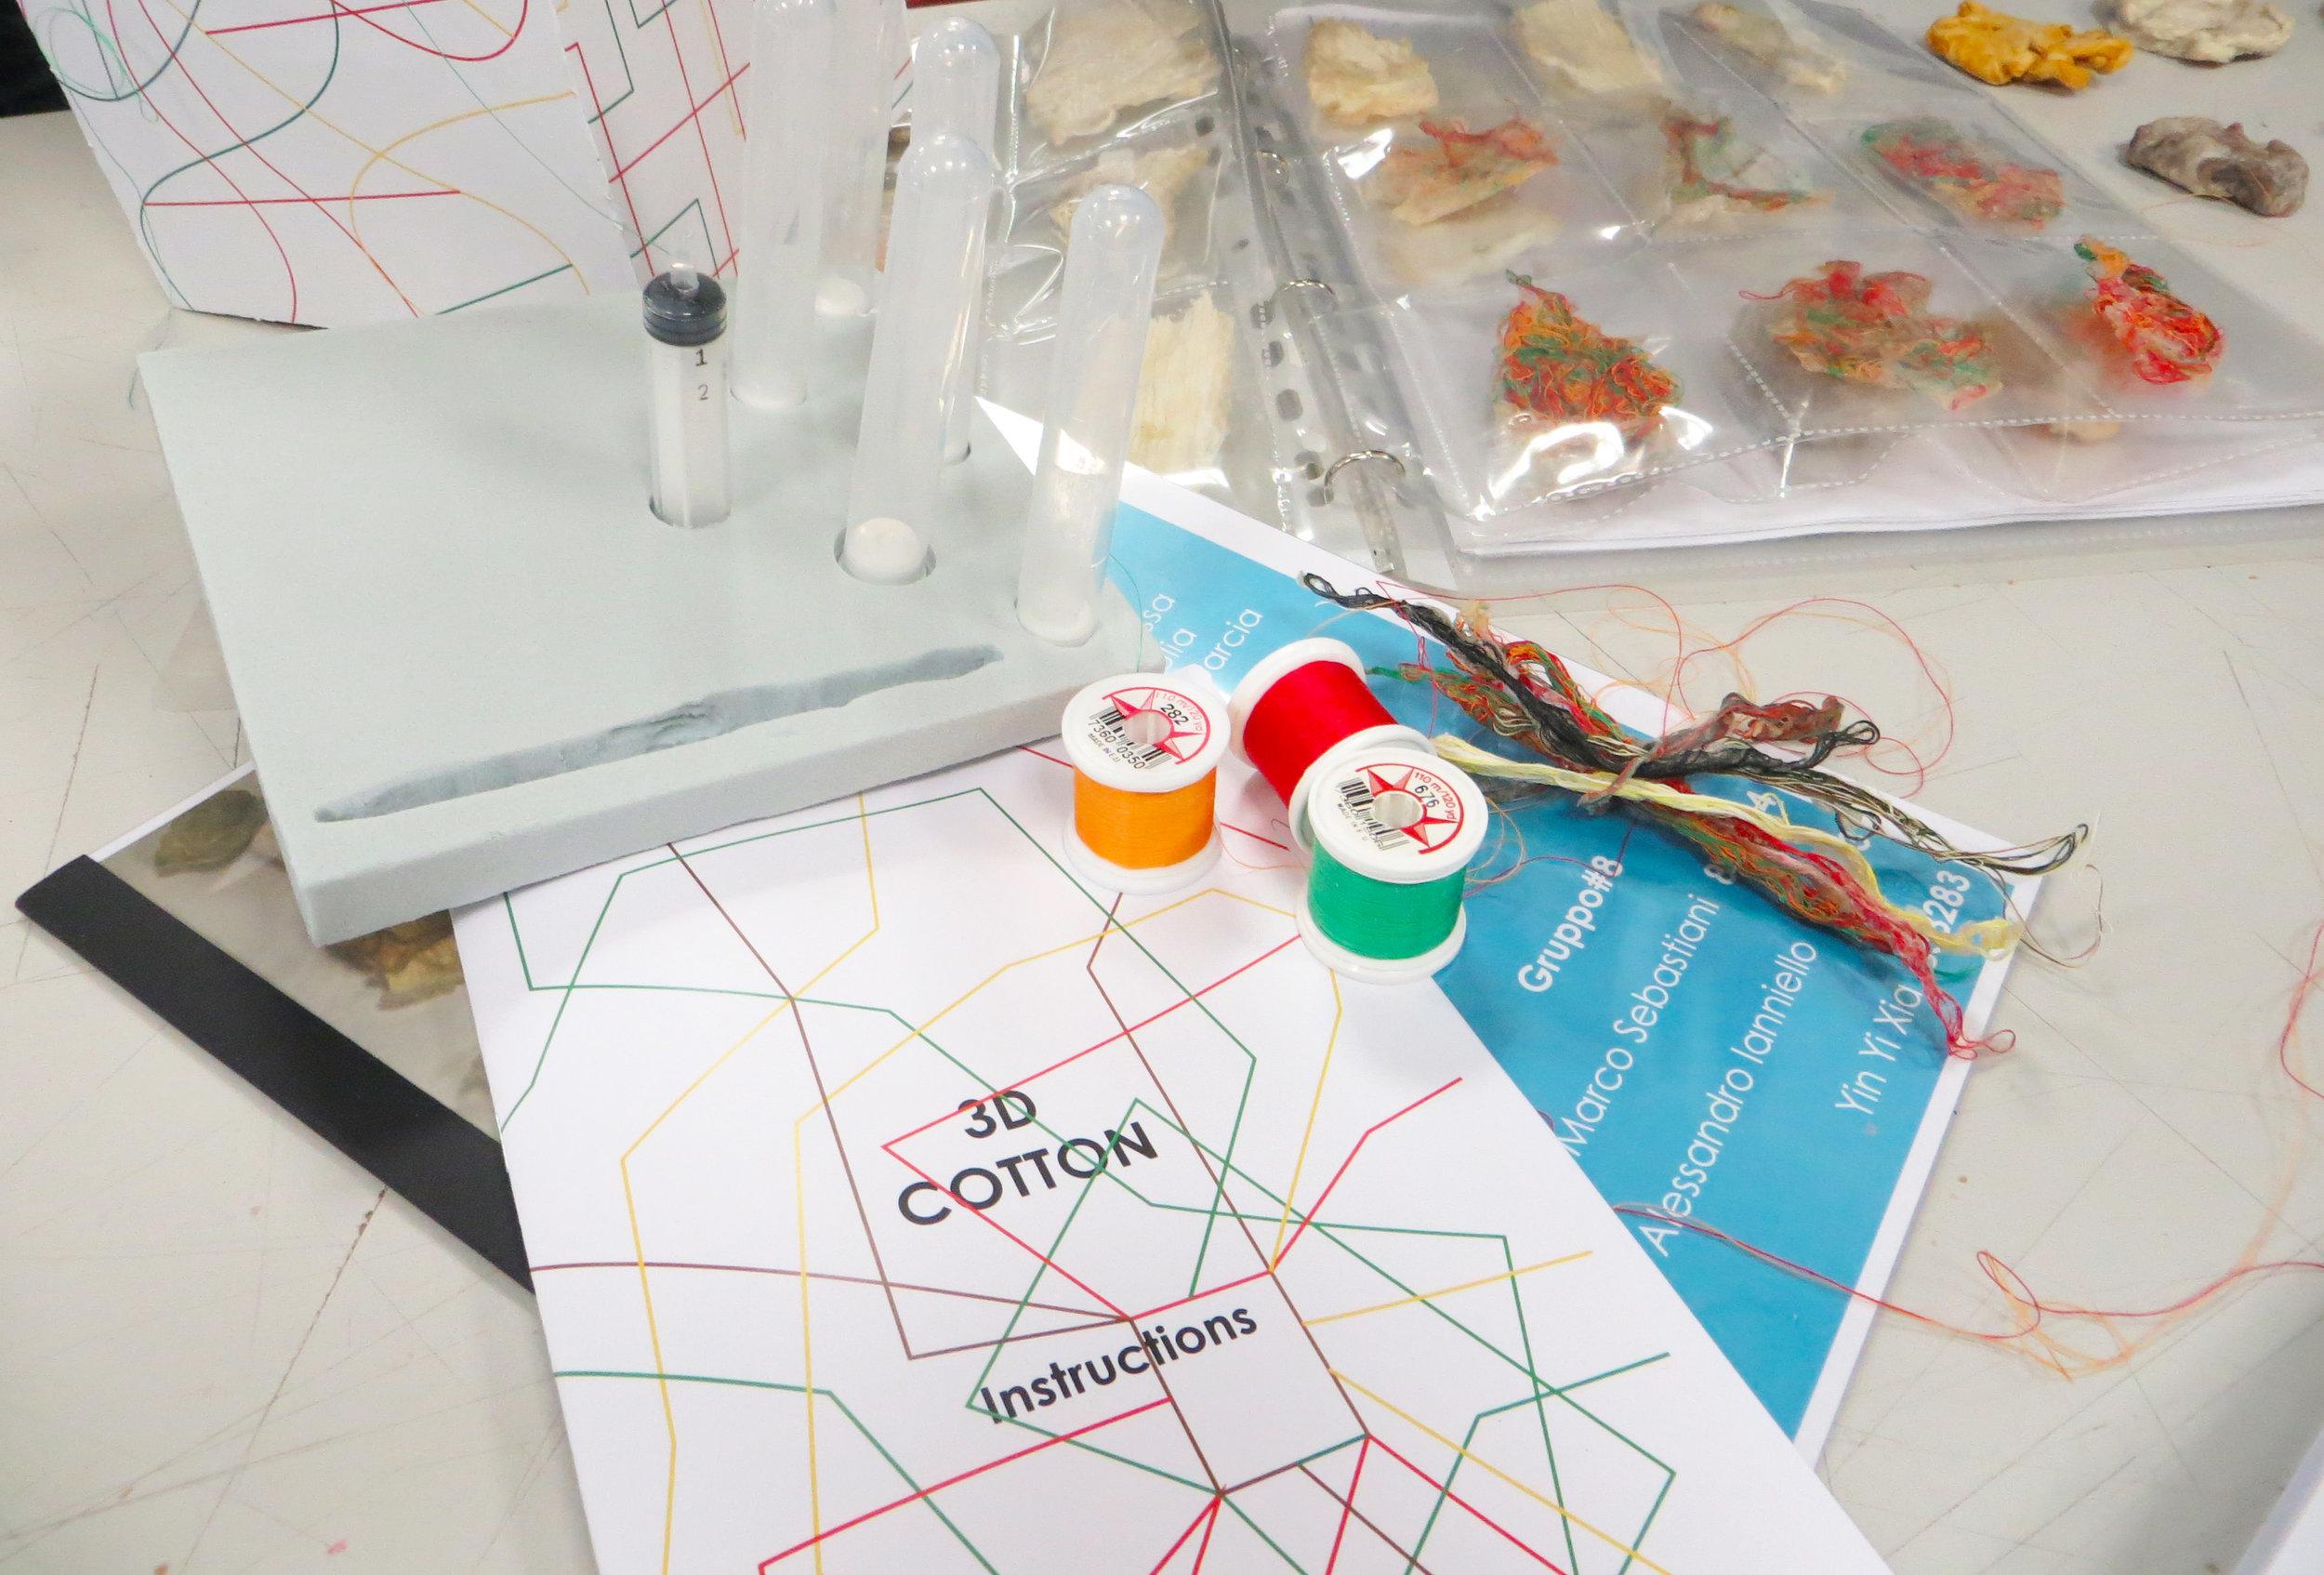 9. 3d cotton examday 3.JPG